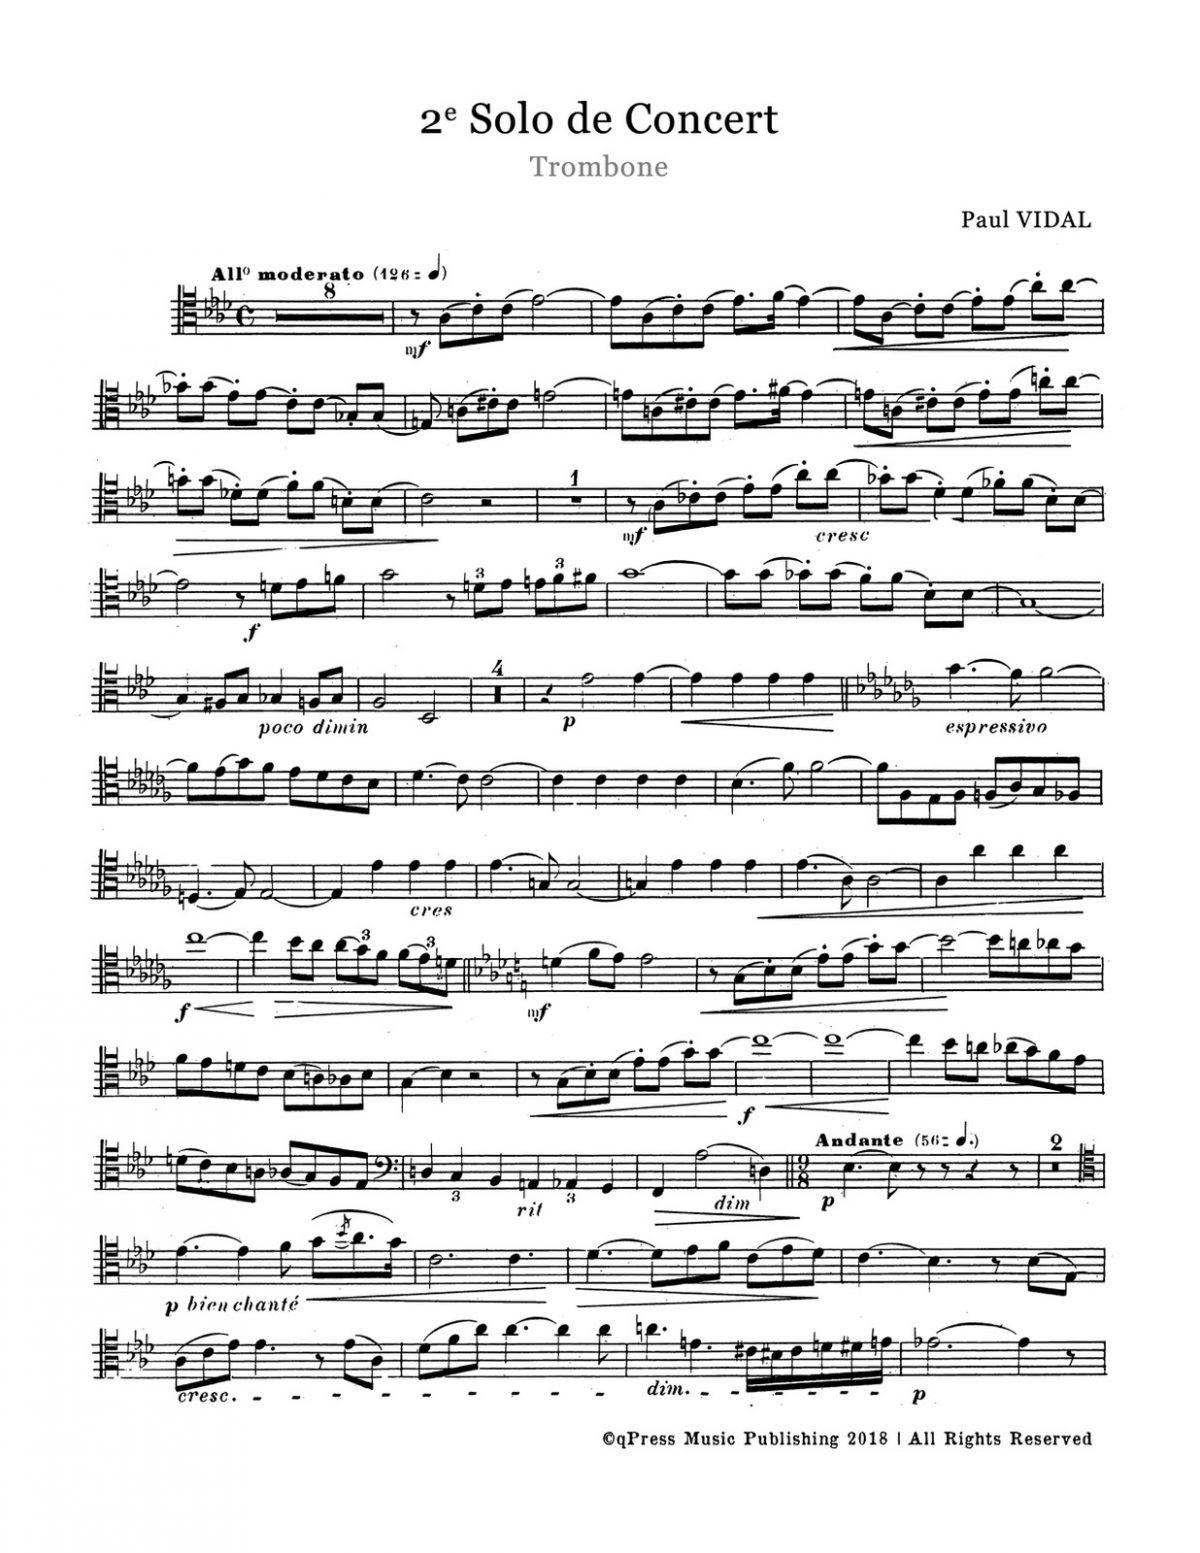 Vidal, 2e Solo de Concert-p03